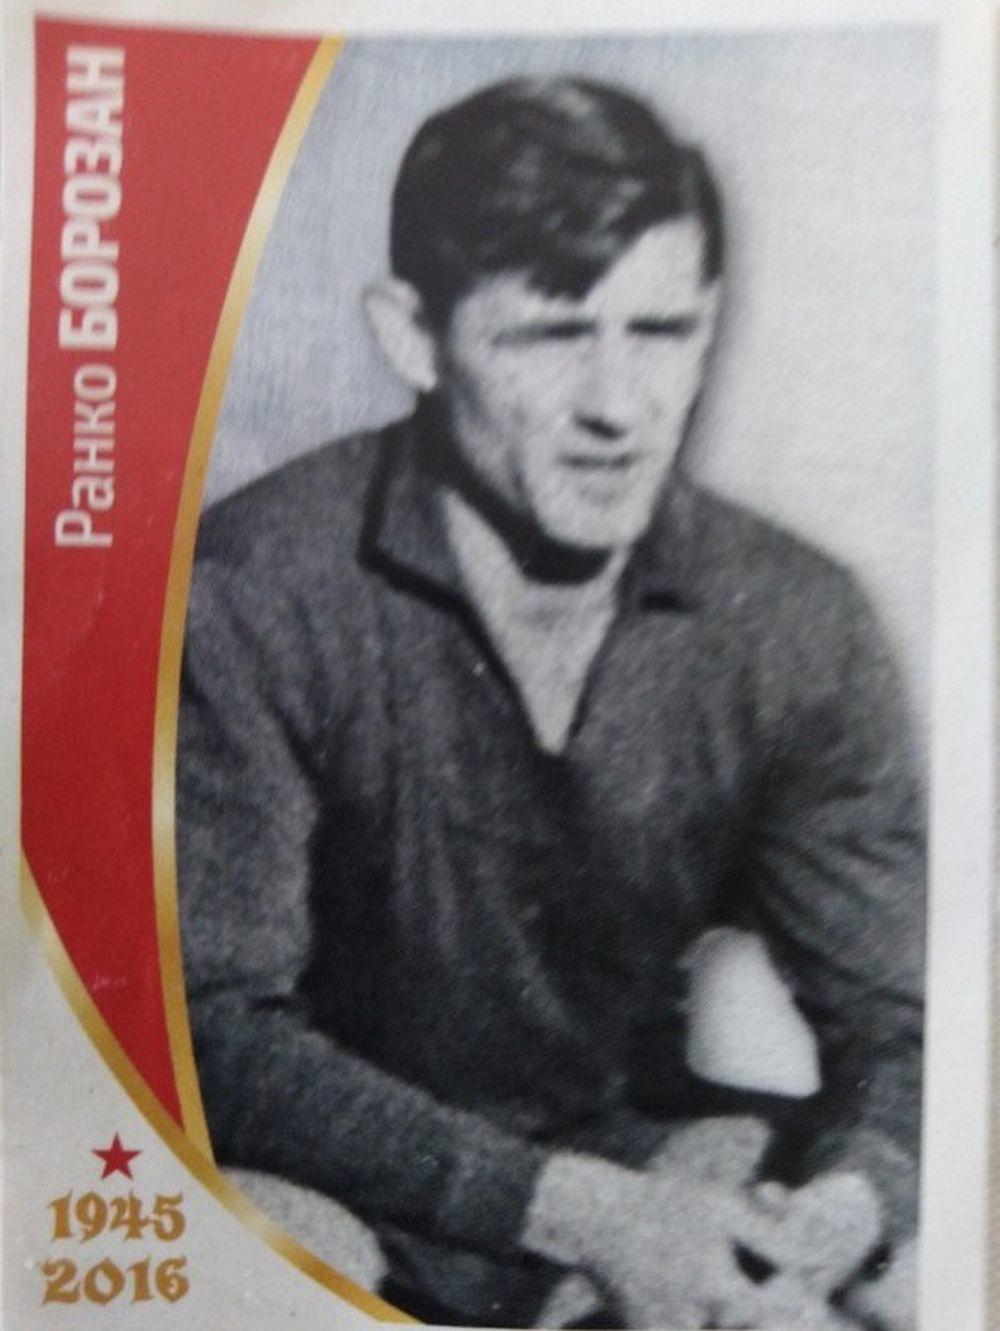 Ranko Borozan